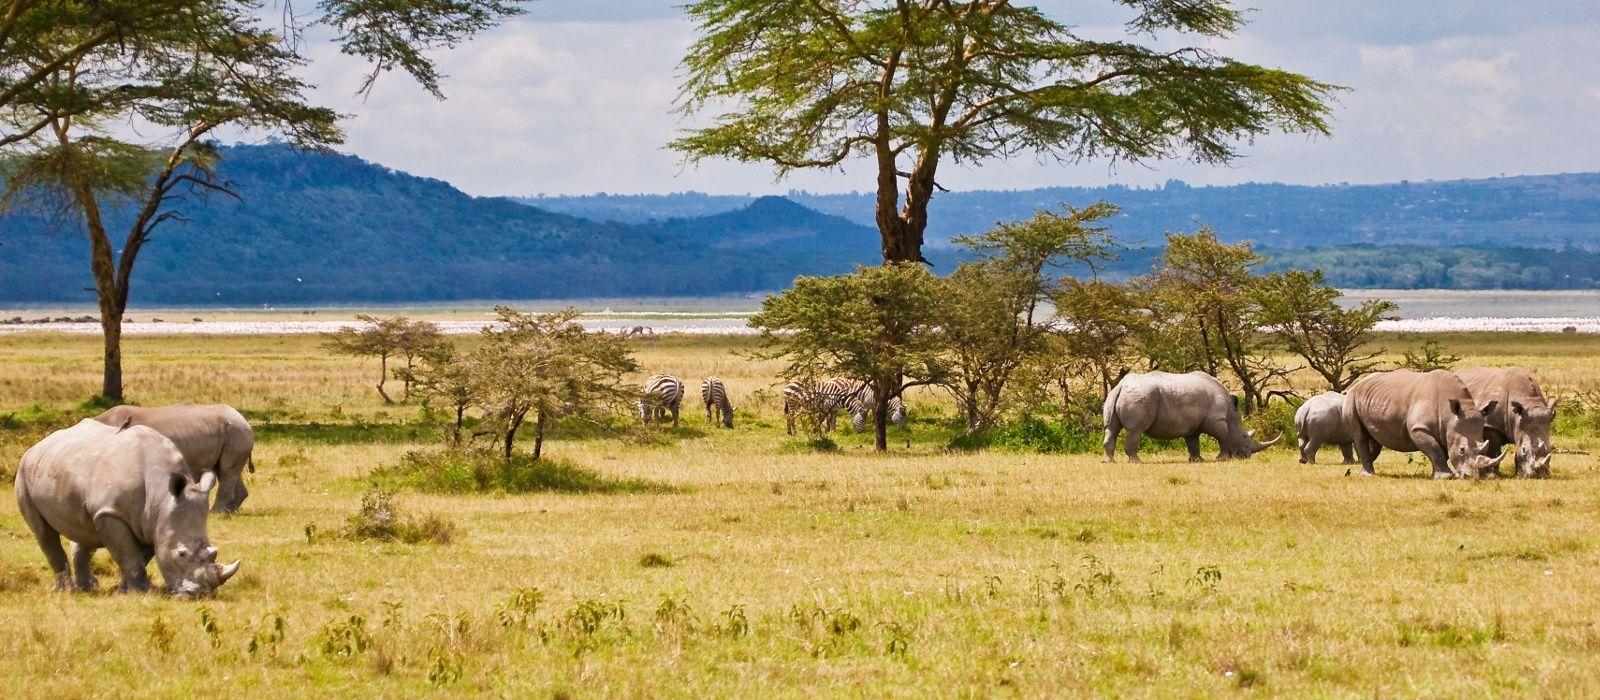 Destination Lake Baringo Kenya